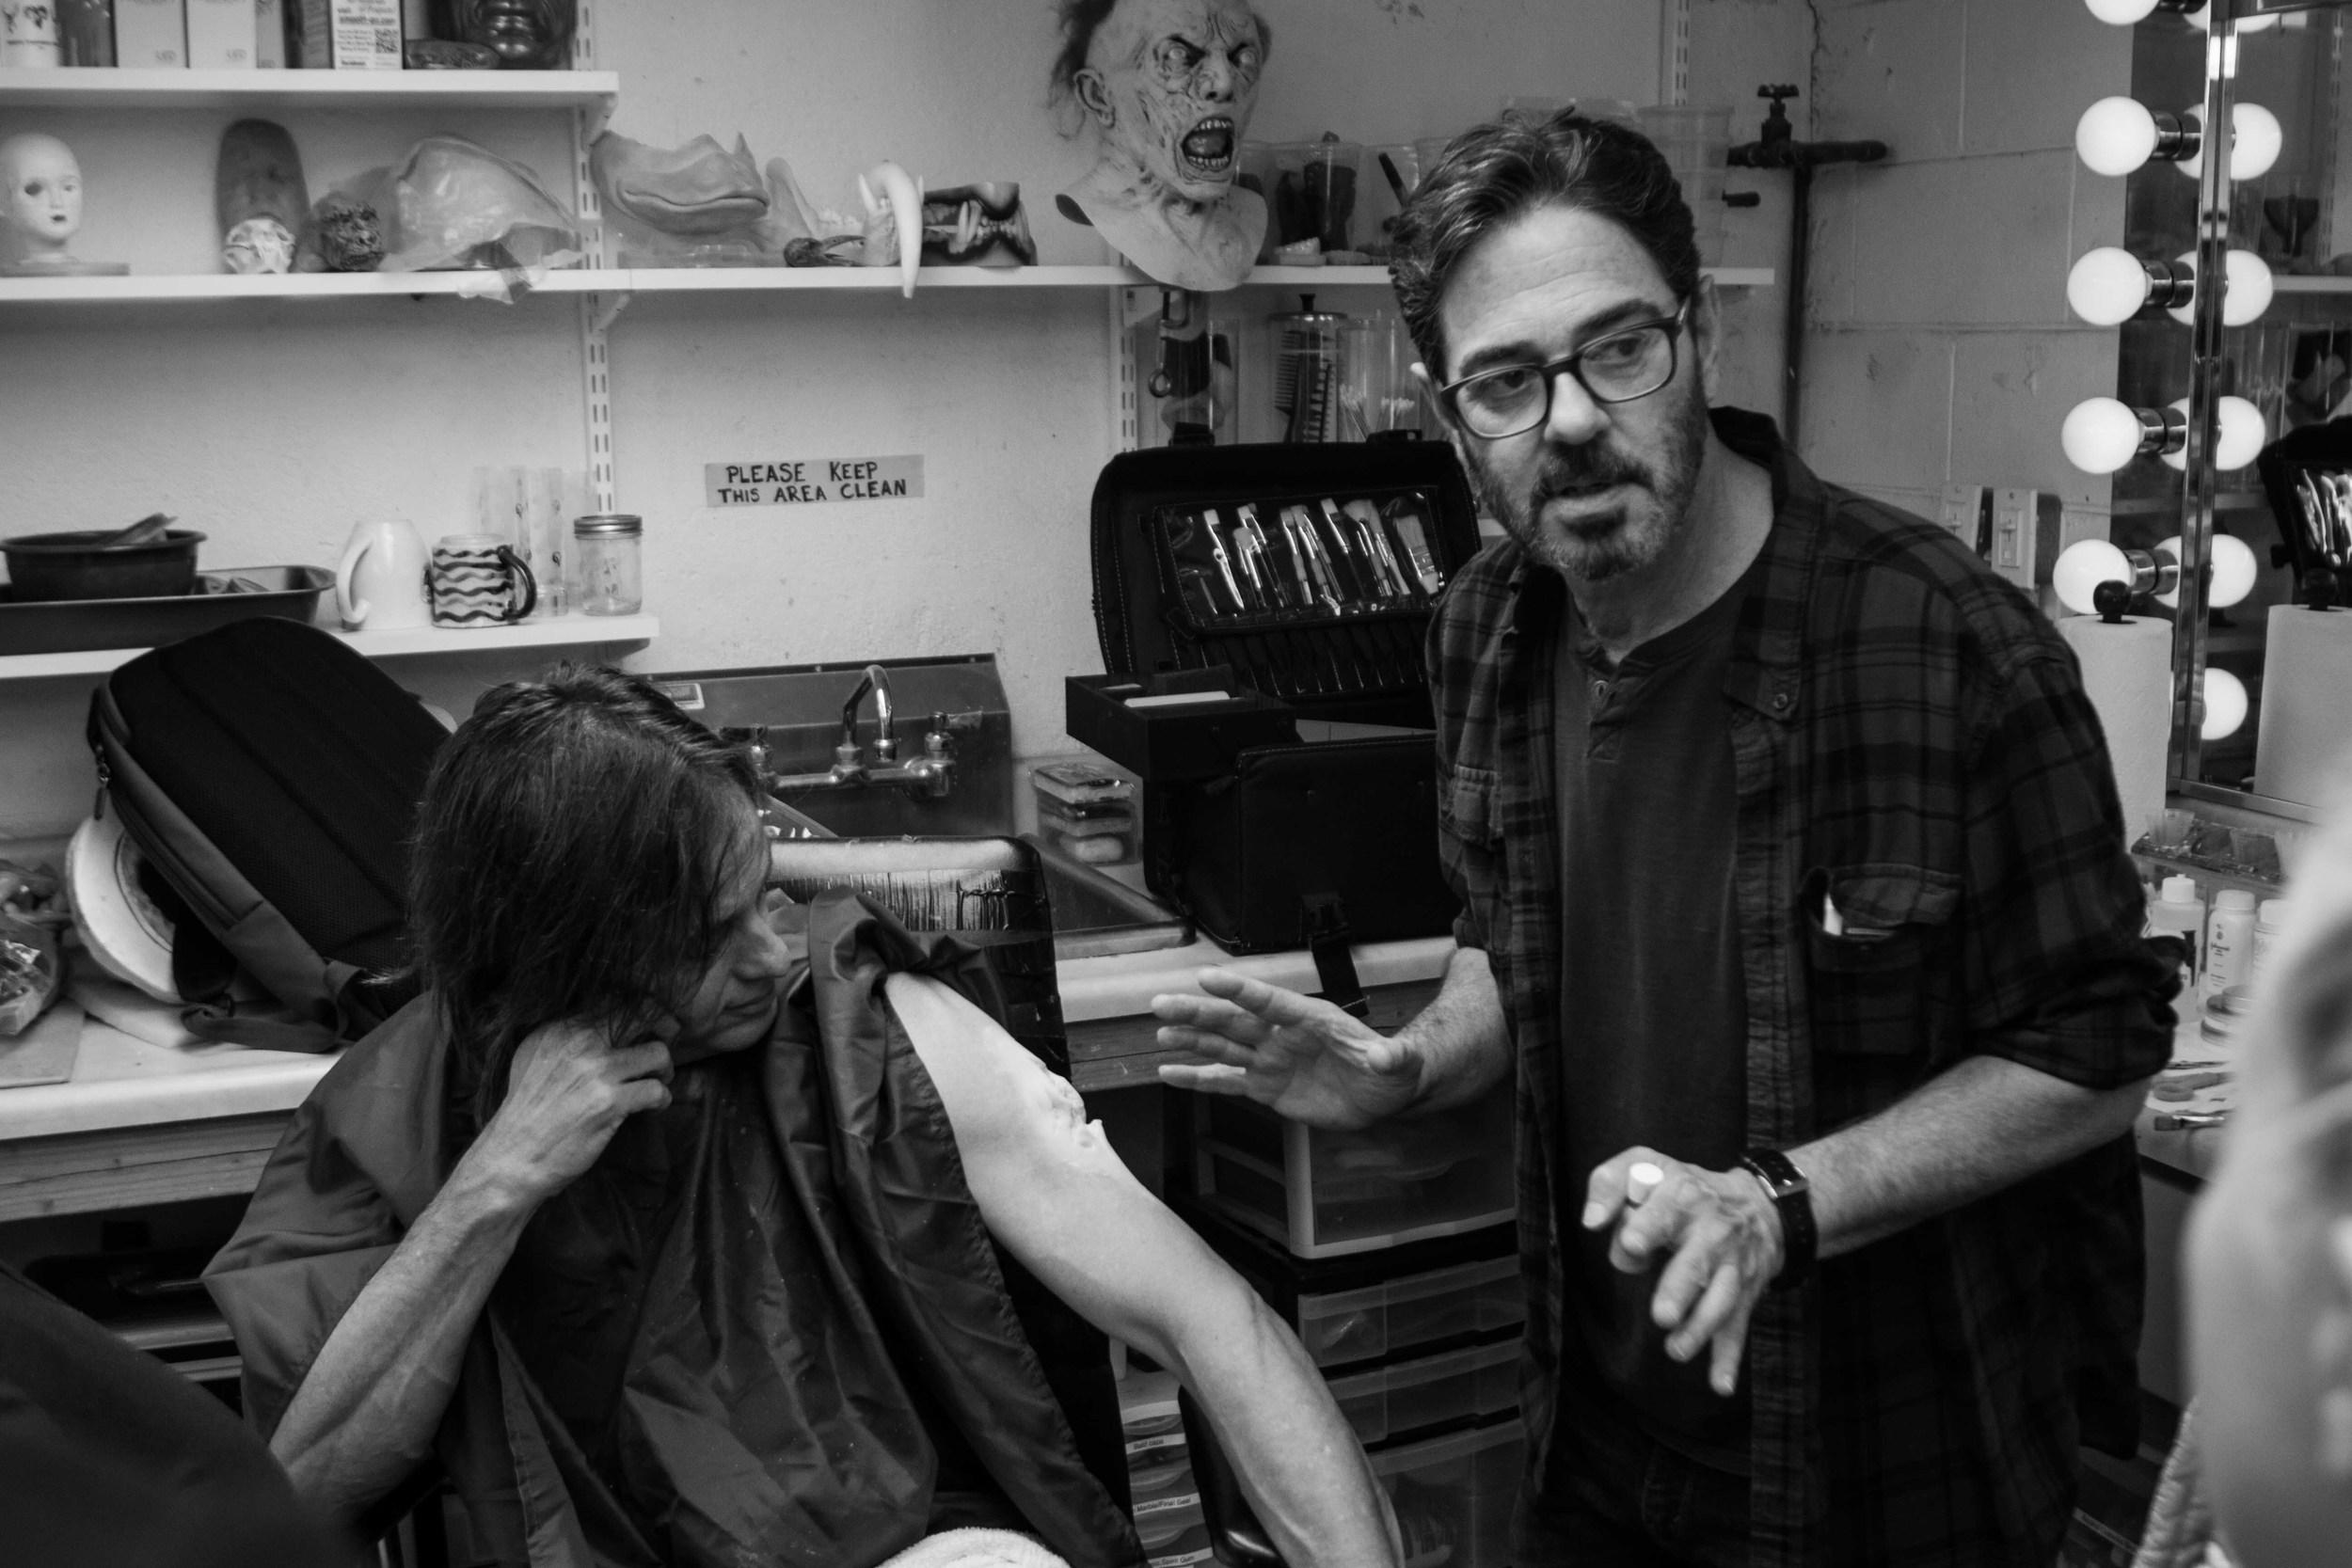 Steve Johnson, Bruna Nogueira, Chris Pitman - Kyle Rea Photography - SFX Special Effects